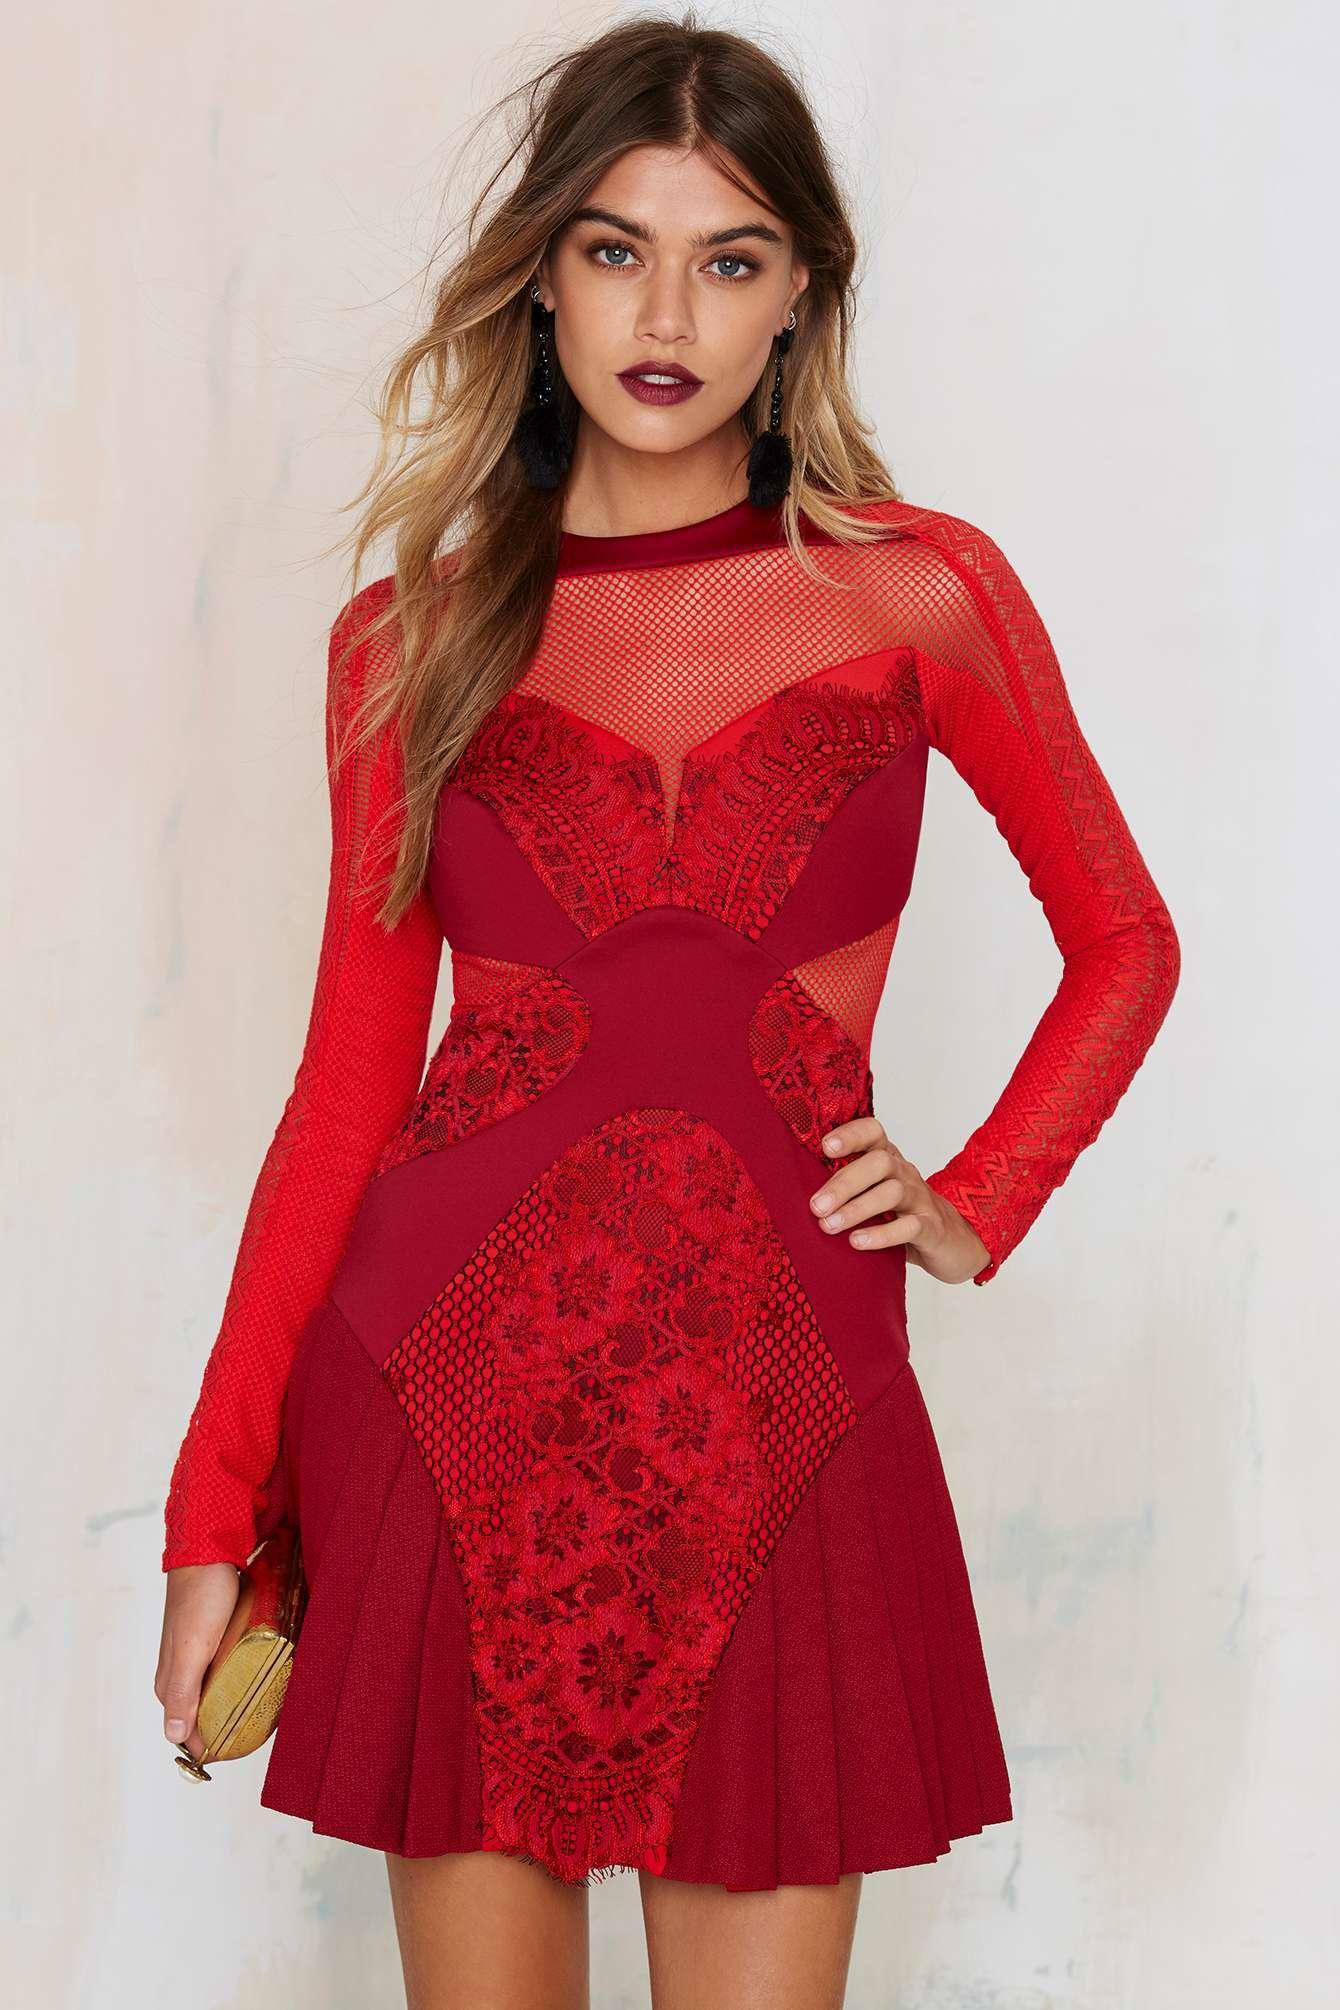 3 floor red dress looks